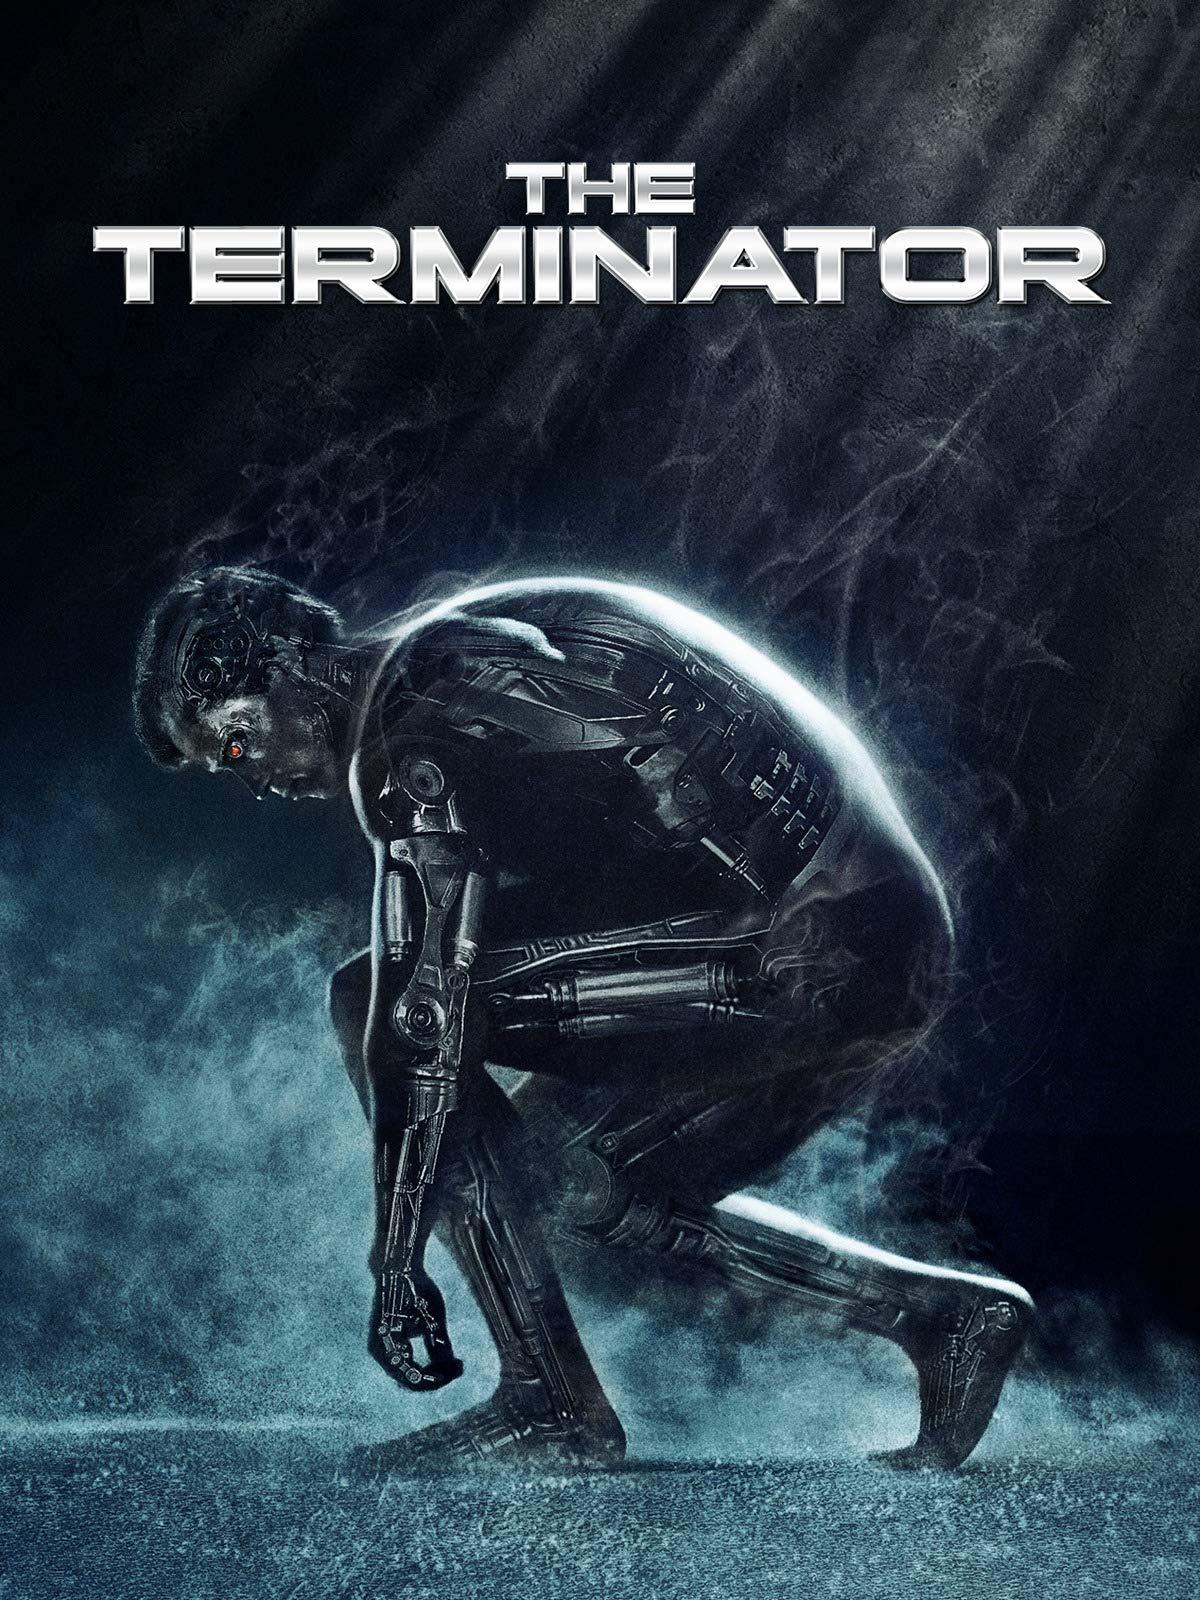 Amazon.com: The Terminator: Arnold Schwarzenegger, Michael Biehn ...